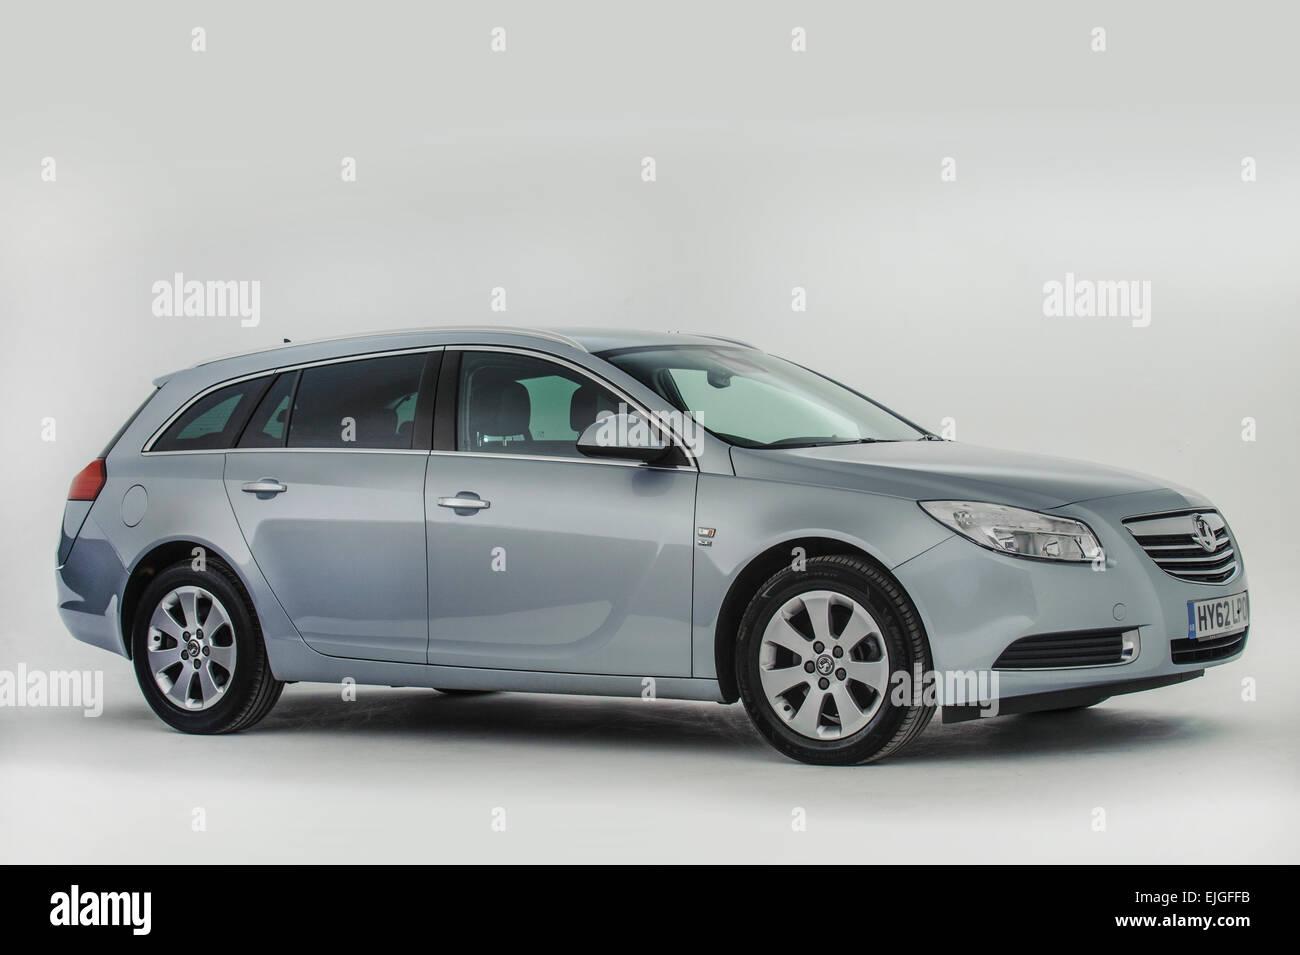 2012 Vauxhall Insignia - Stock Image